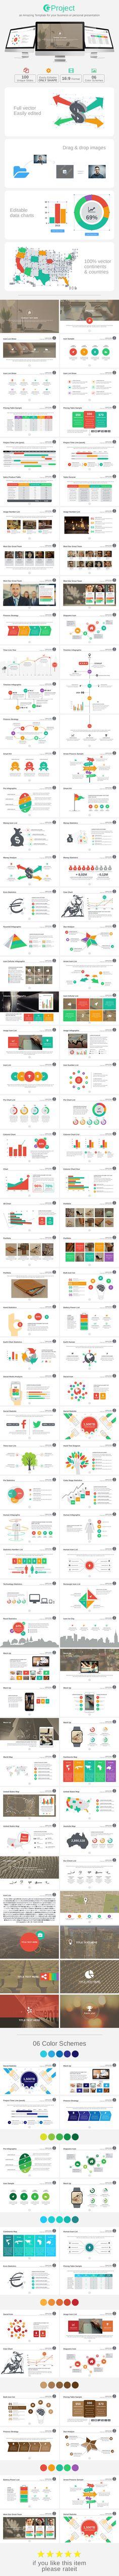 GProject PowerPoint Template #design Download: http://graphicriver.net/item/gproject-powerpoint-template/11540508?ref=ksioks